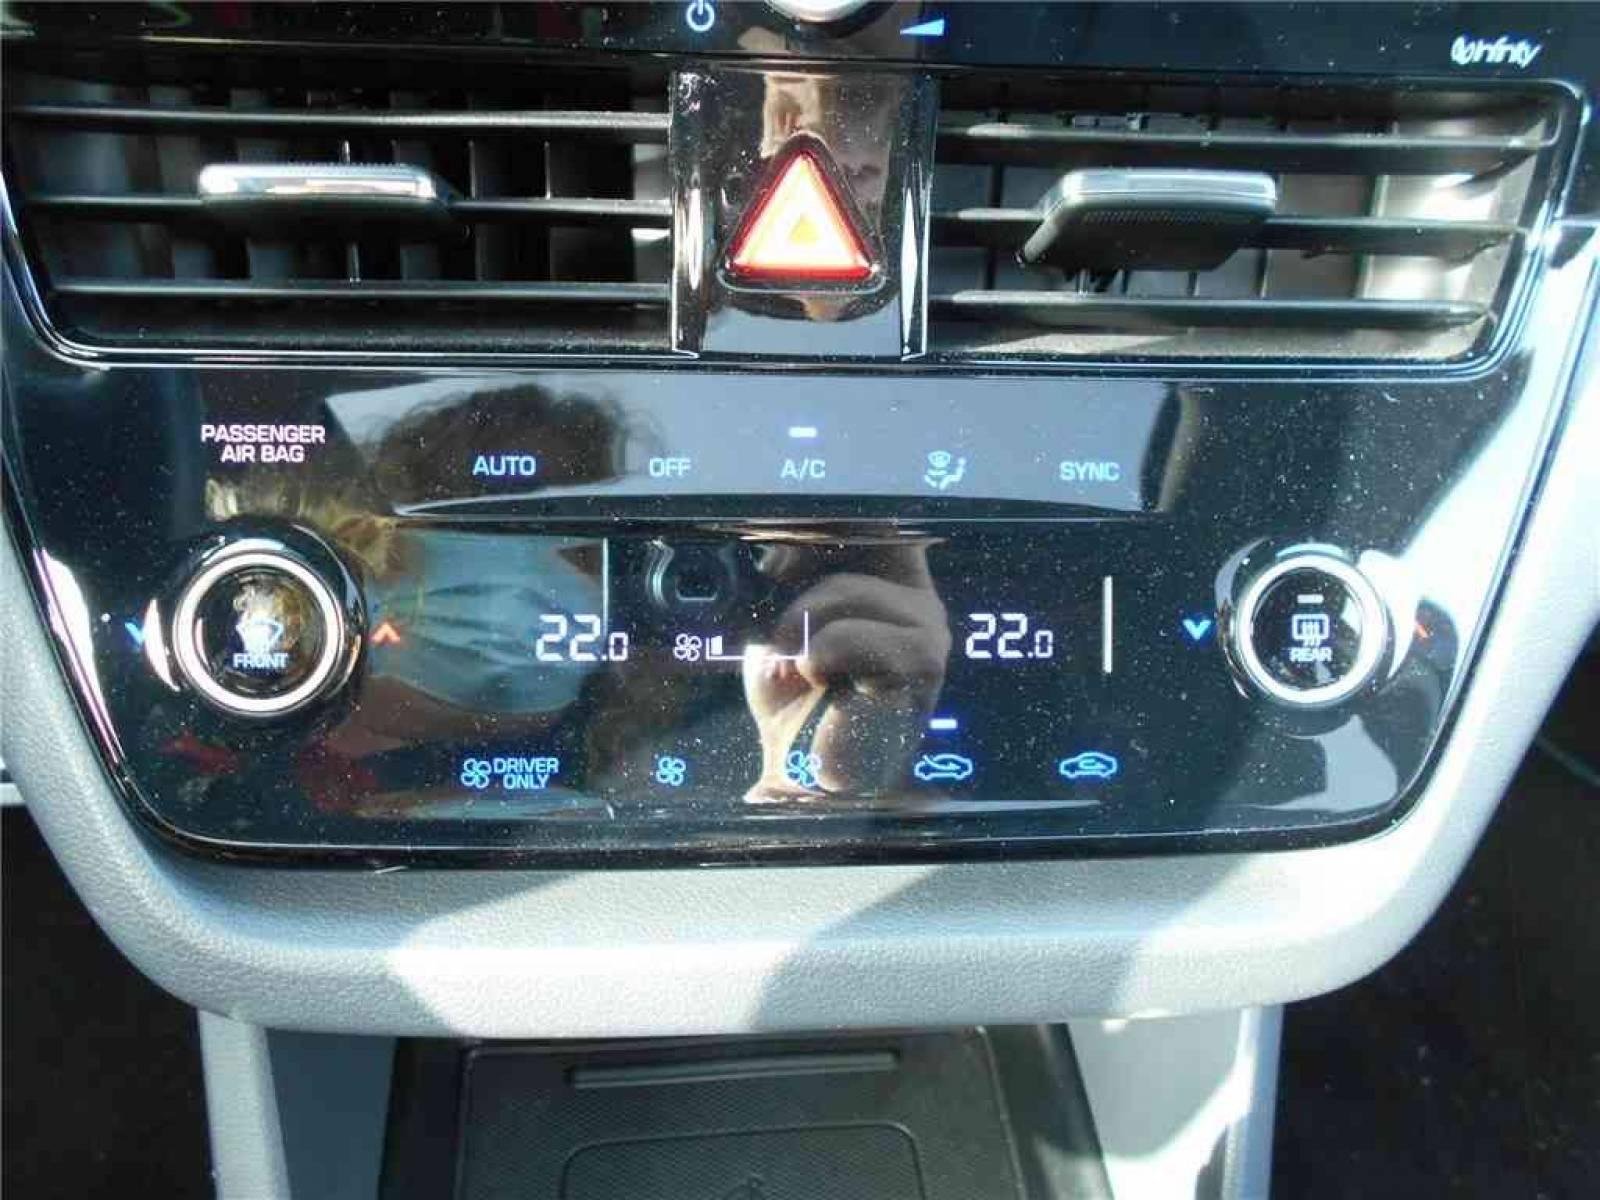 HYUNDAI Ioniq Plug-in 141 ch - véhicule d'occasion - Groupe Guillet - Chalon Automobiles - 71100 - Chalon-sur-Saône - 14